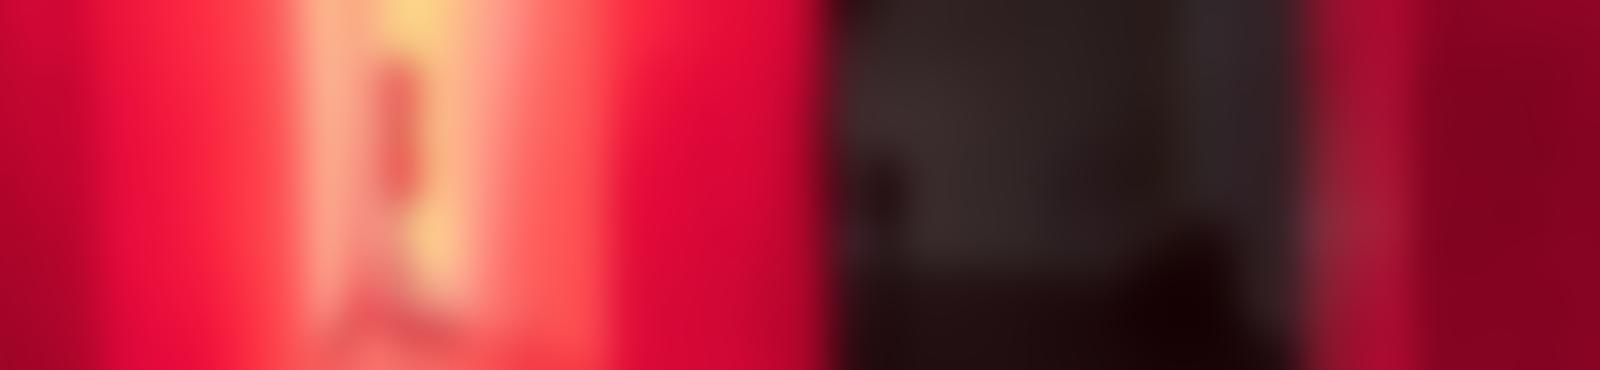 Blurred 2f8d19d1 ad71 4405 bdcd 857149ed3506